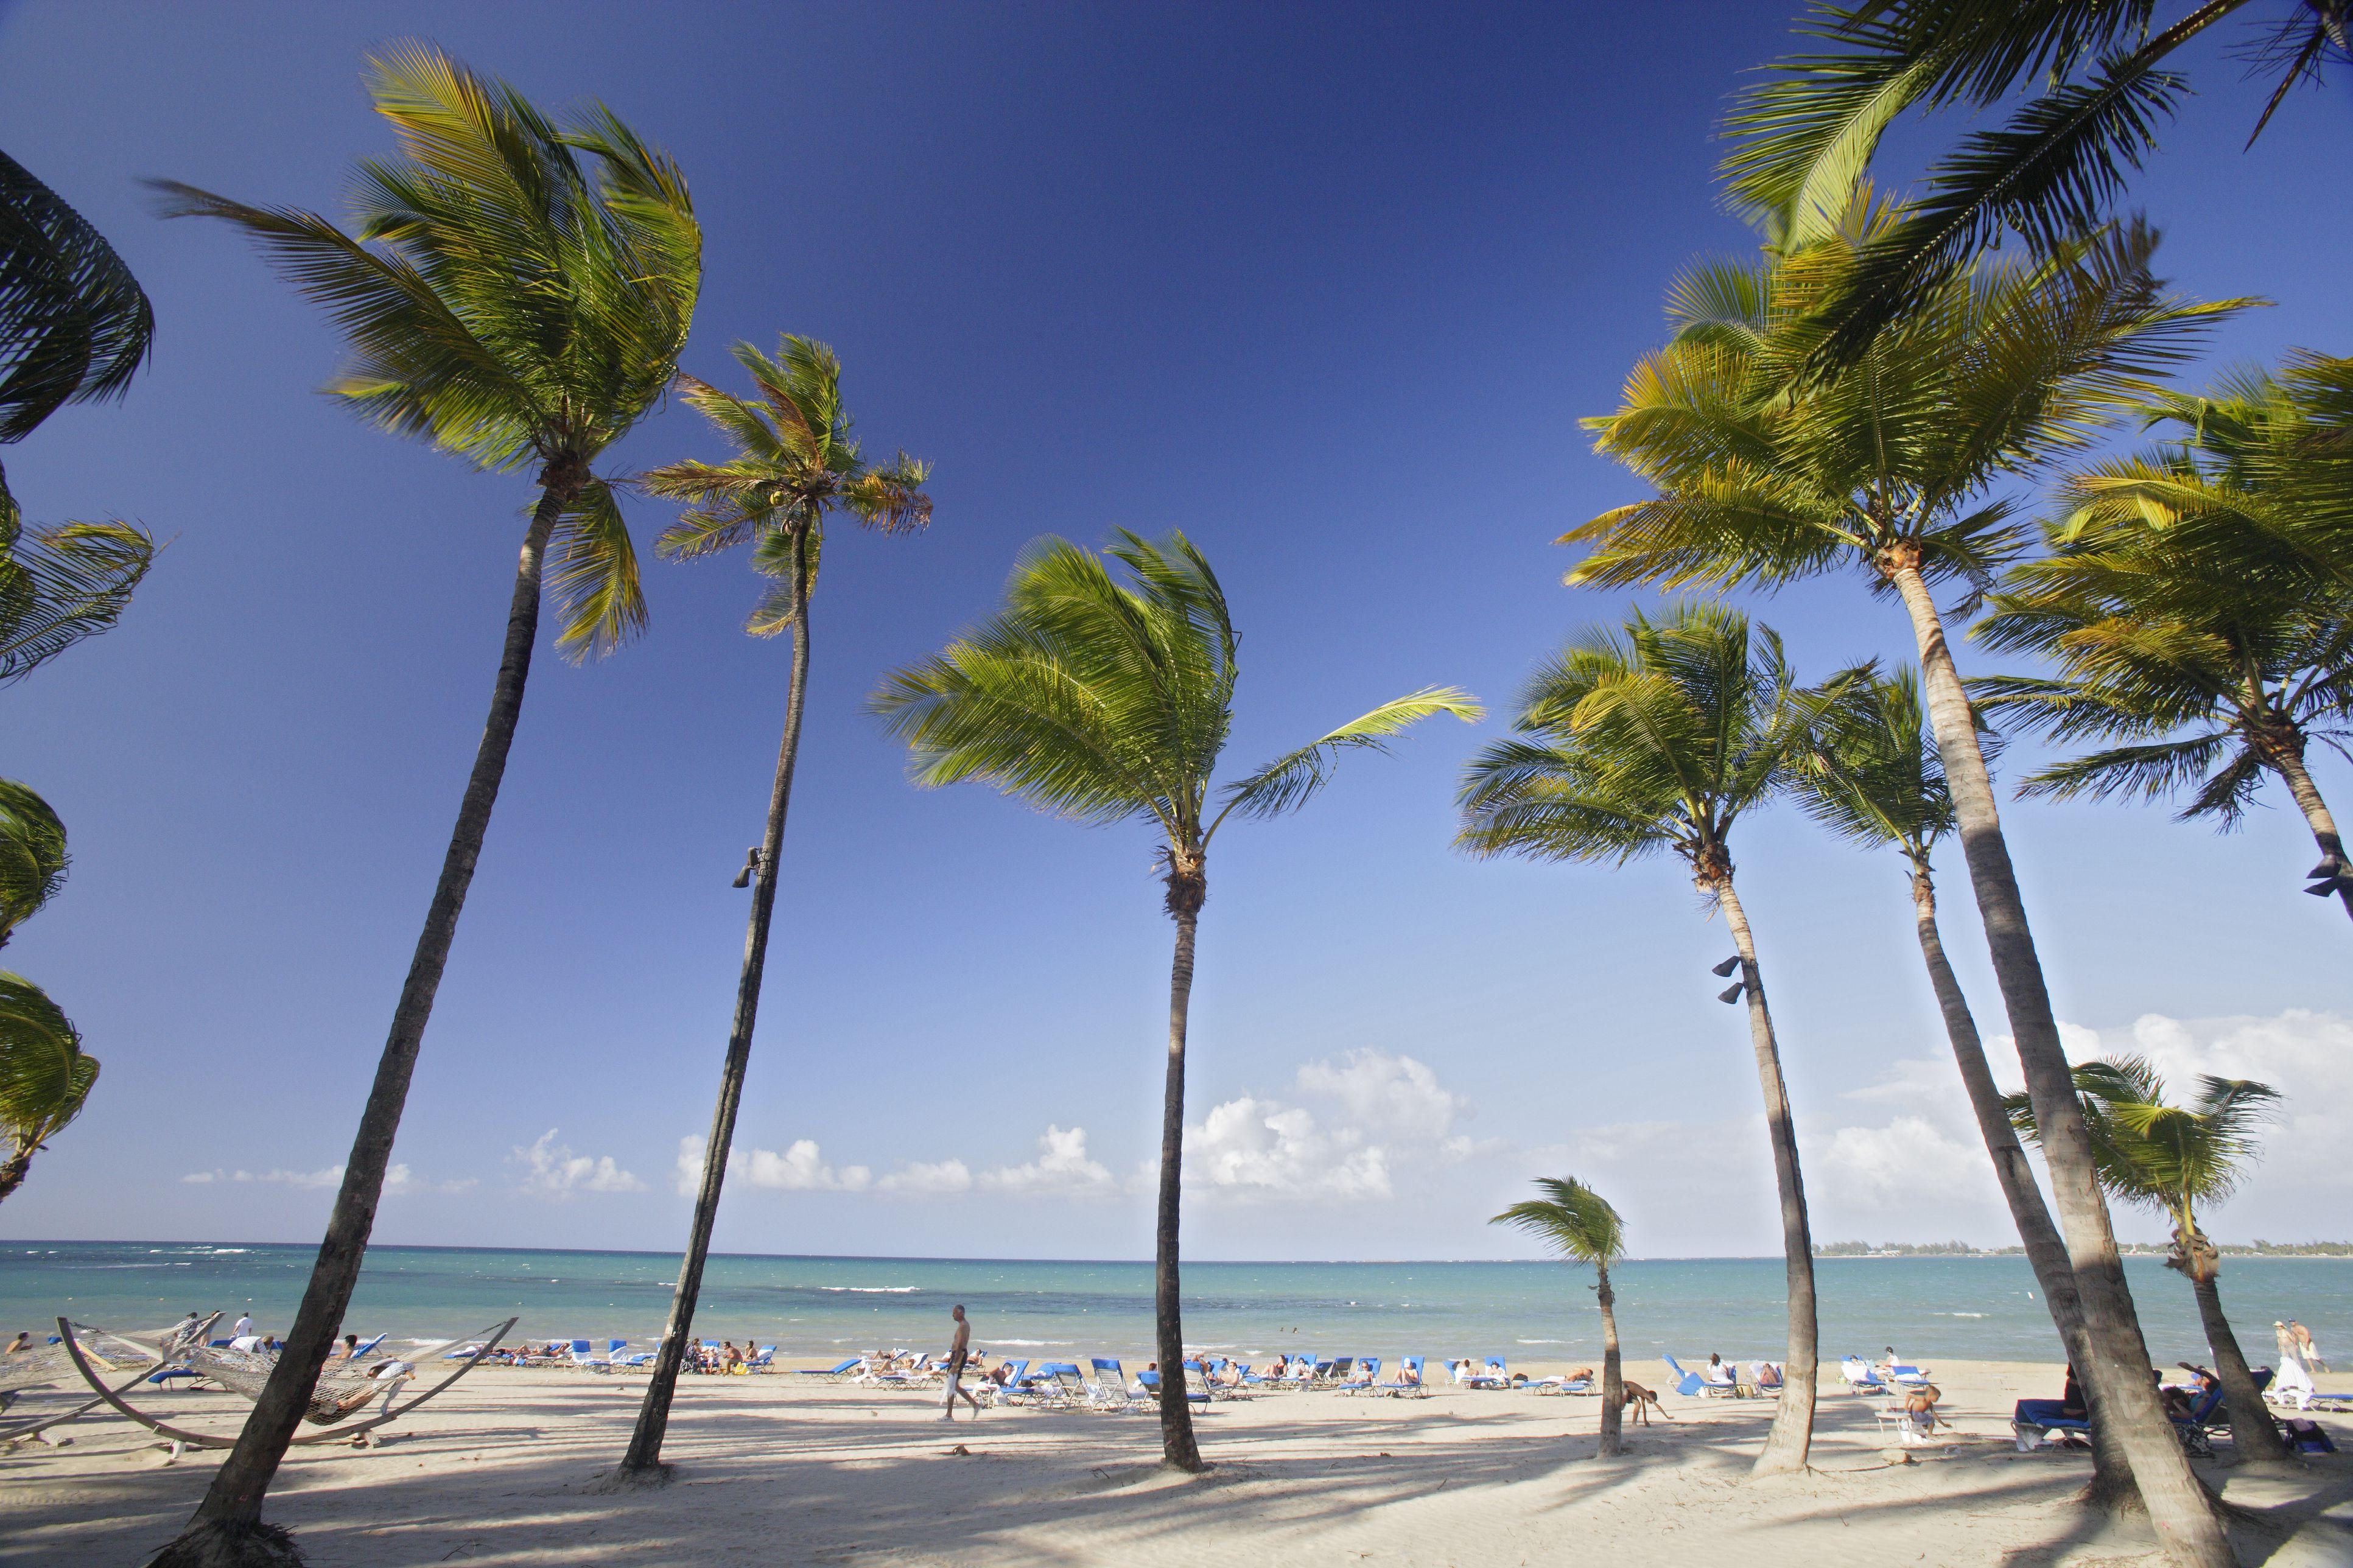 Beach at Ritz Carlton, Isla Verde.